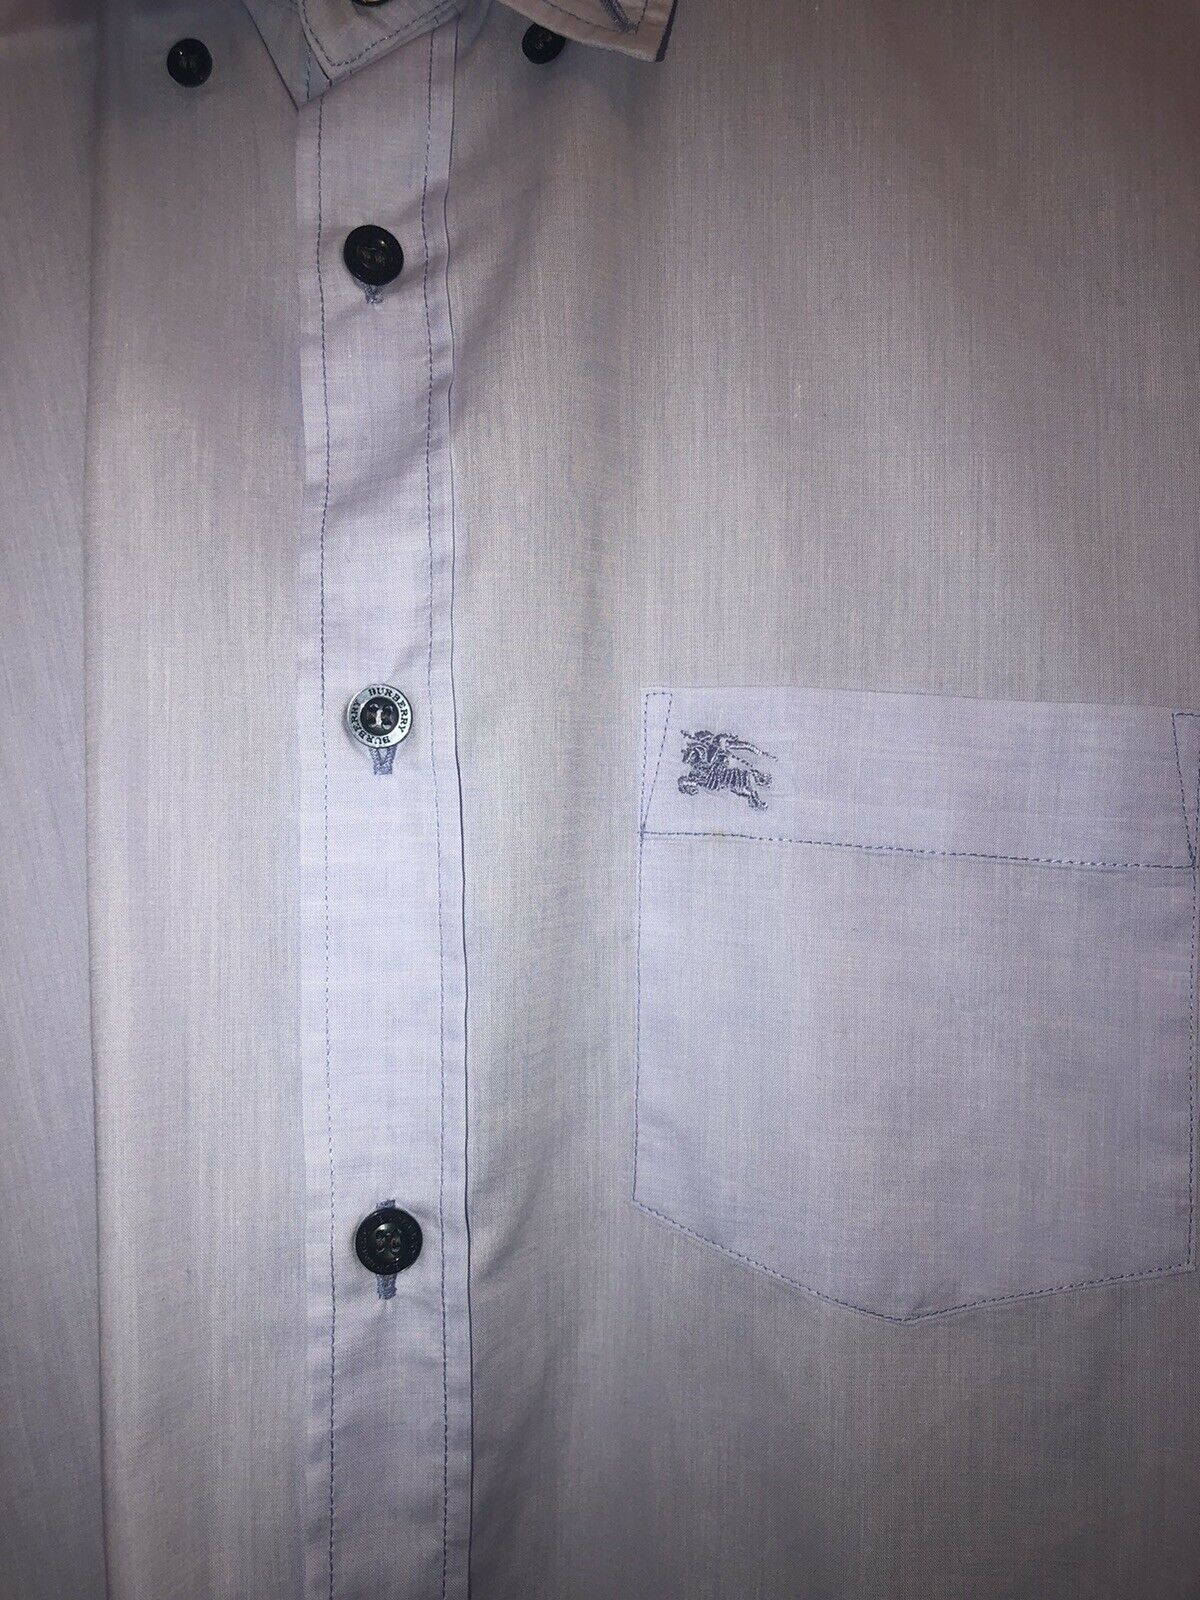 Burberry Button Up Shirt - image 4